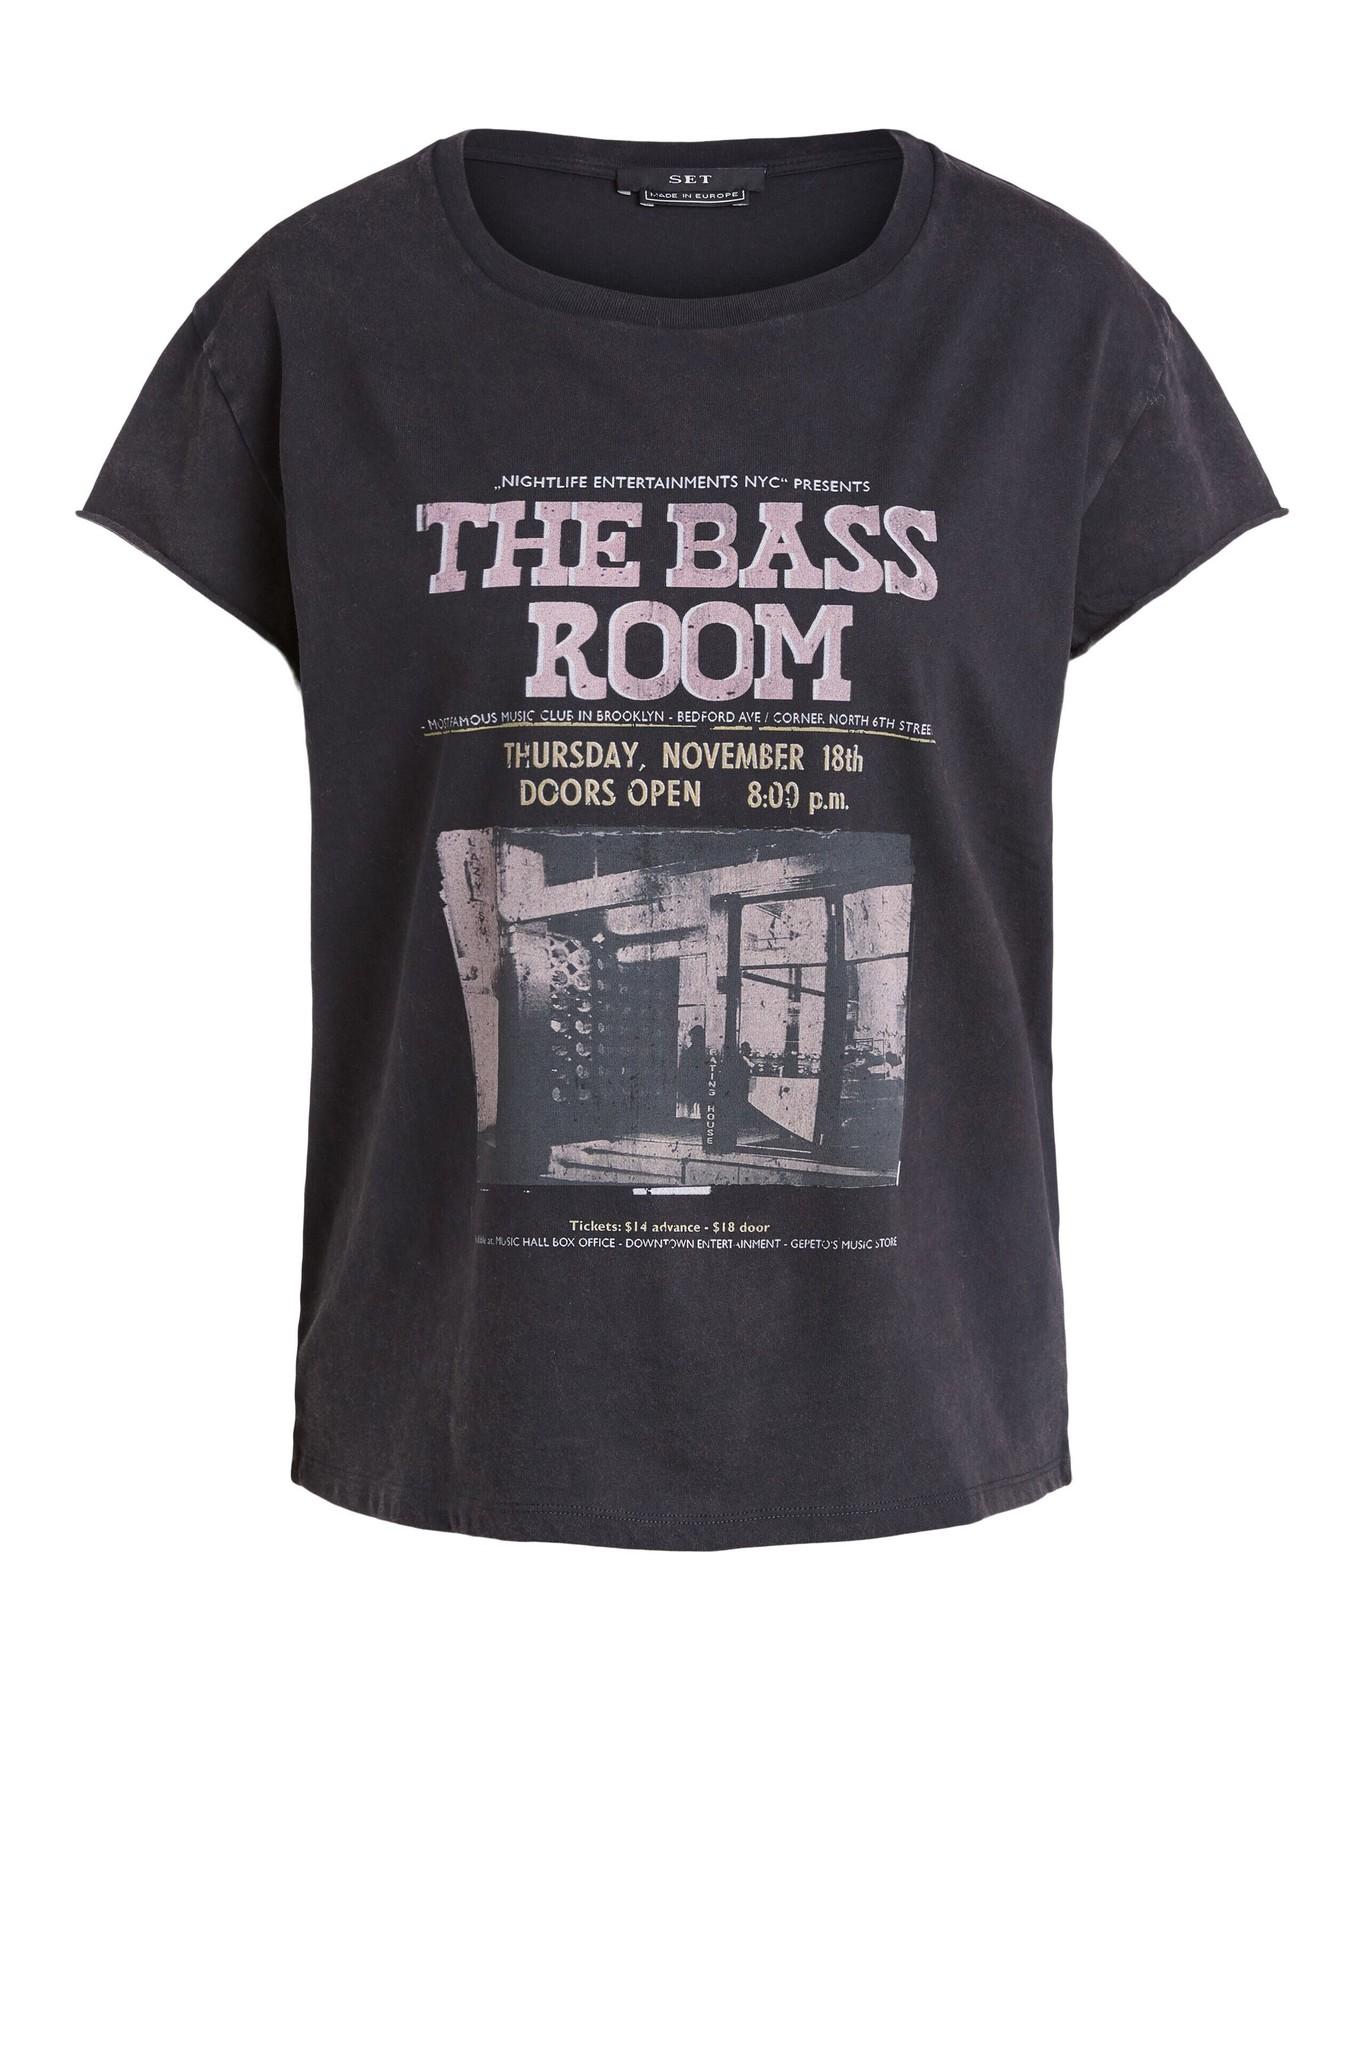 SET t-shirt 74082 9990-1